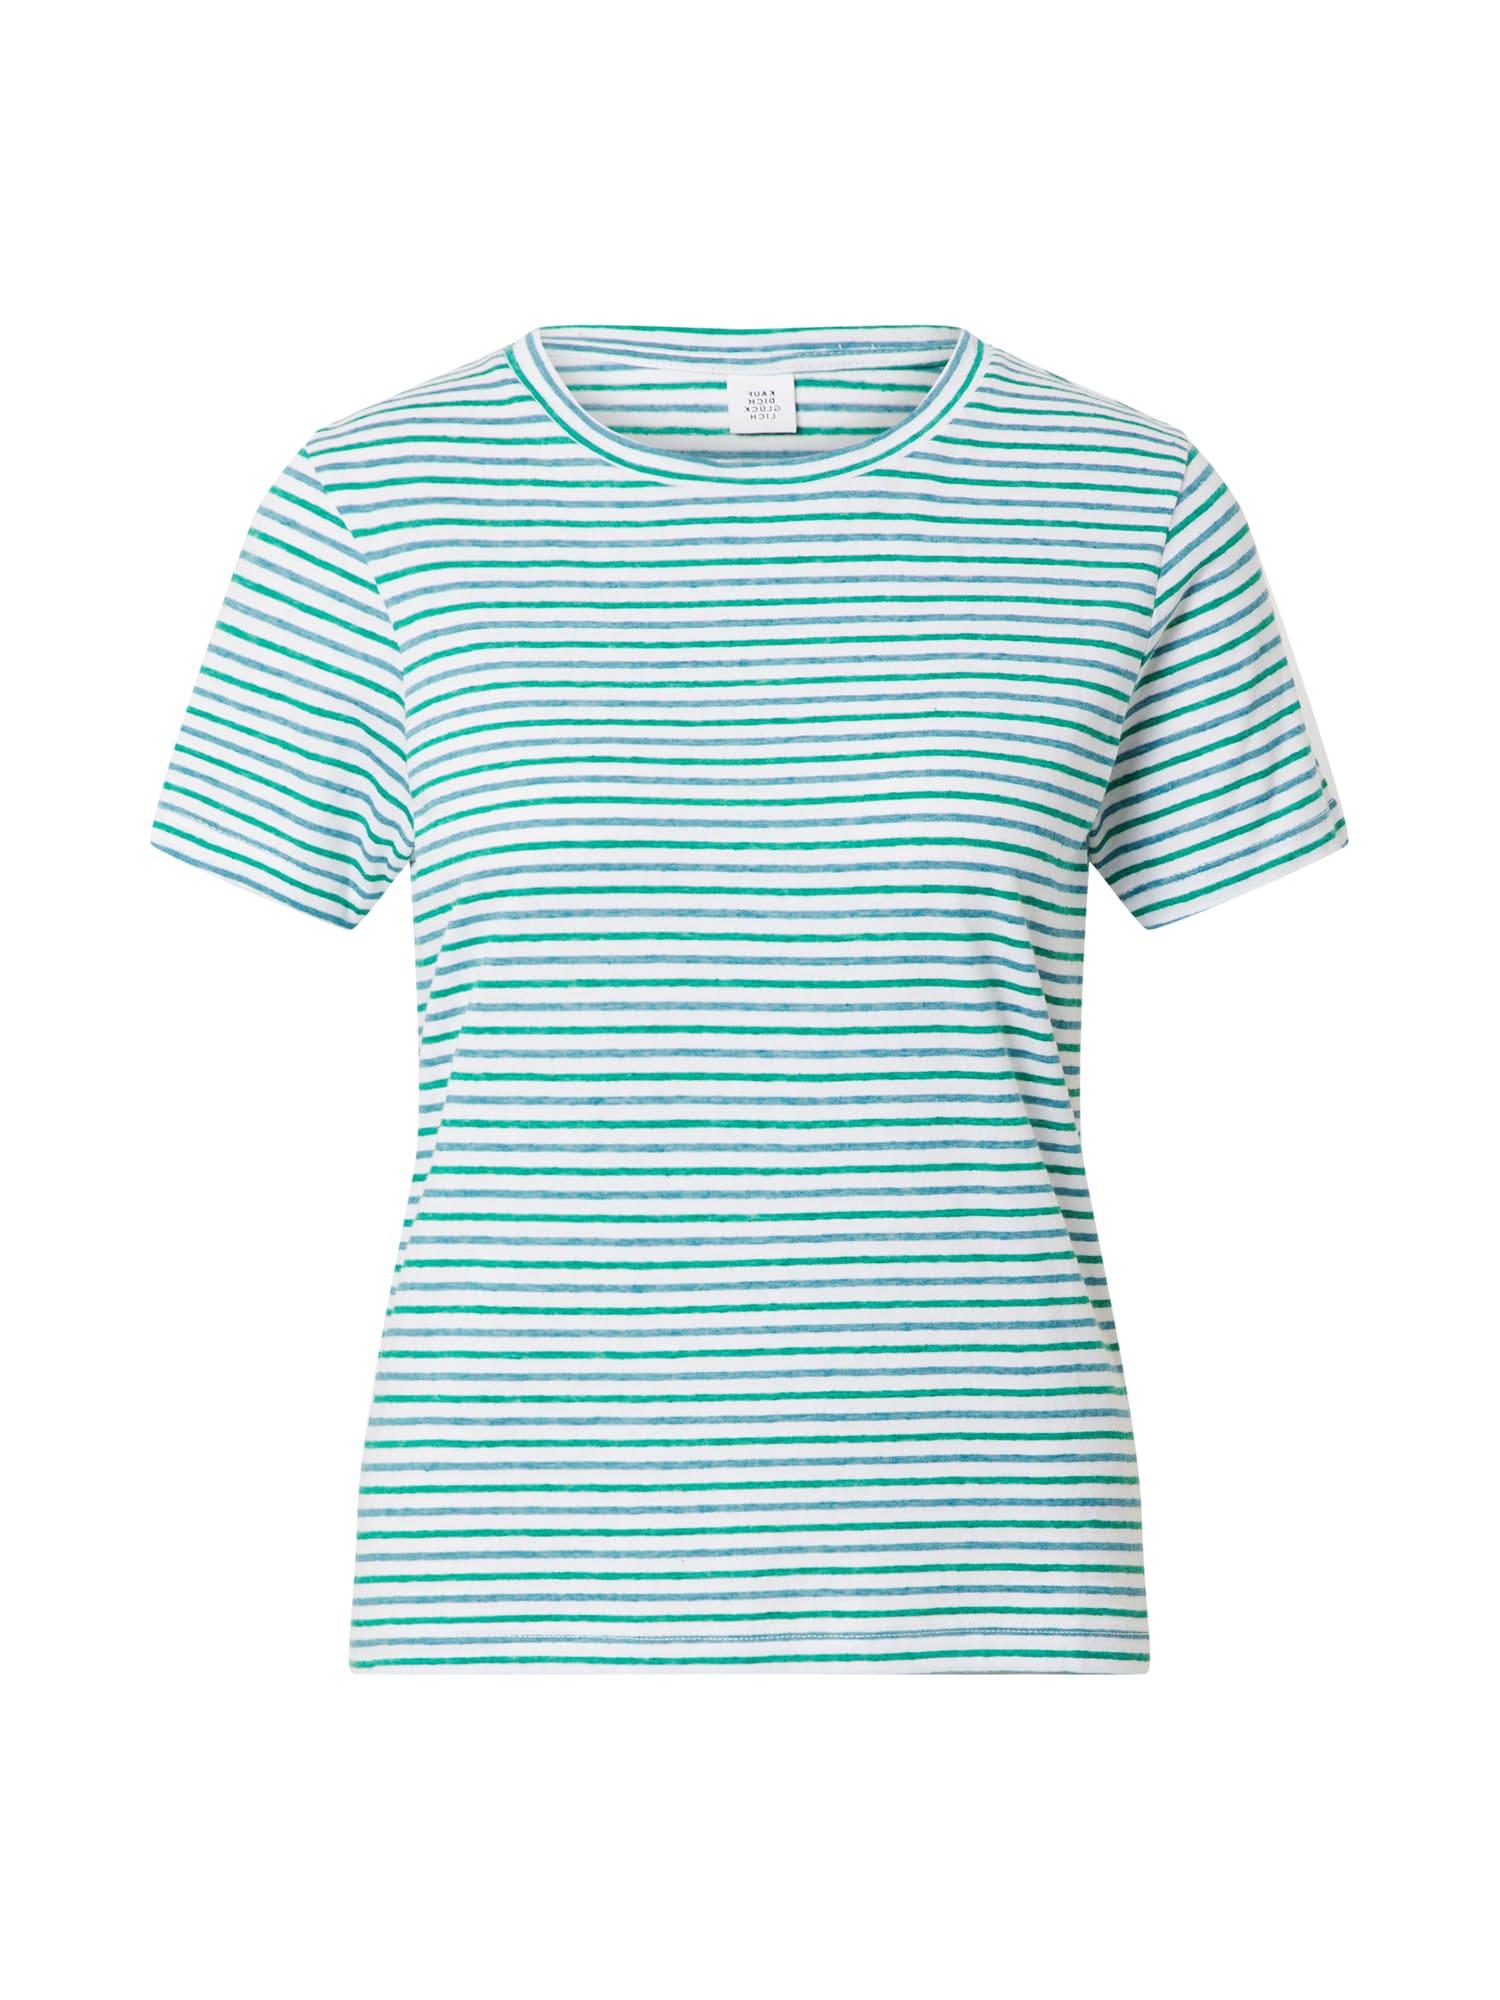 Kauf Dich Glücklich Marškinėliai šviesiai mėlyna / smaragdinė spalva / balta / melsvai pilka